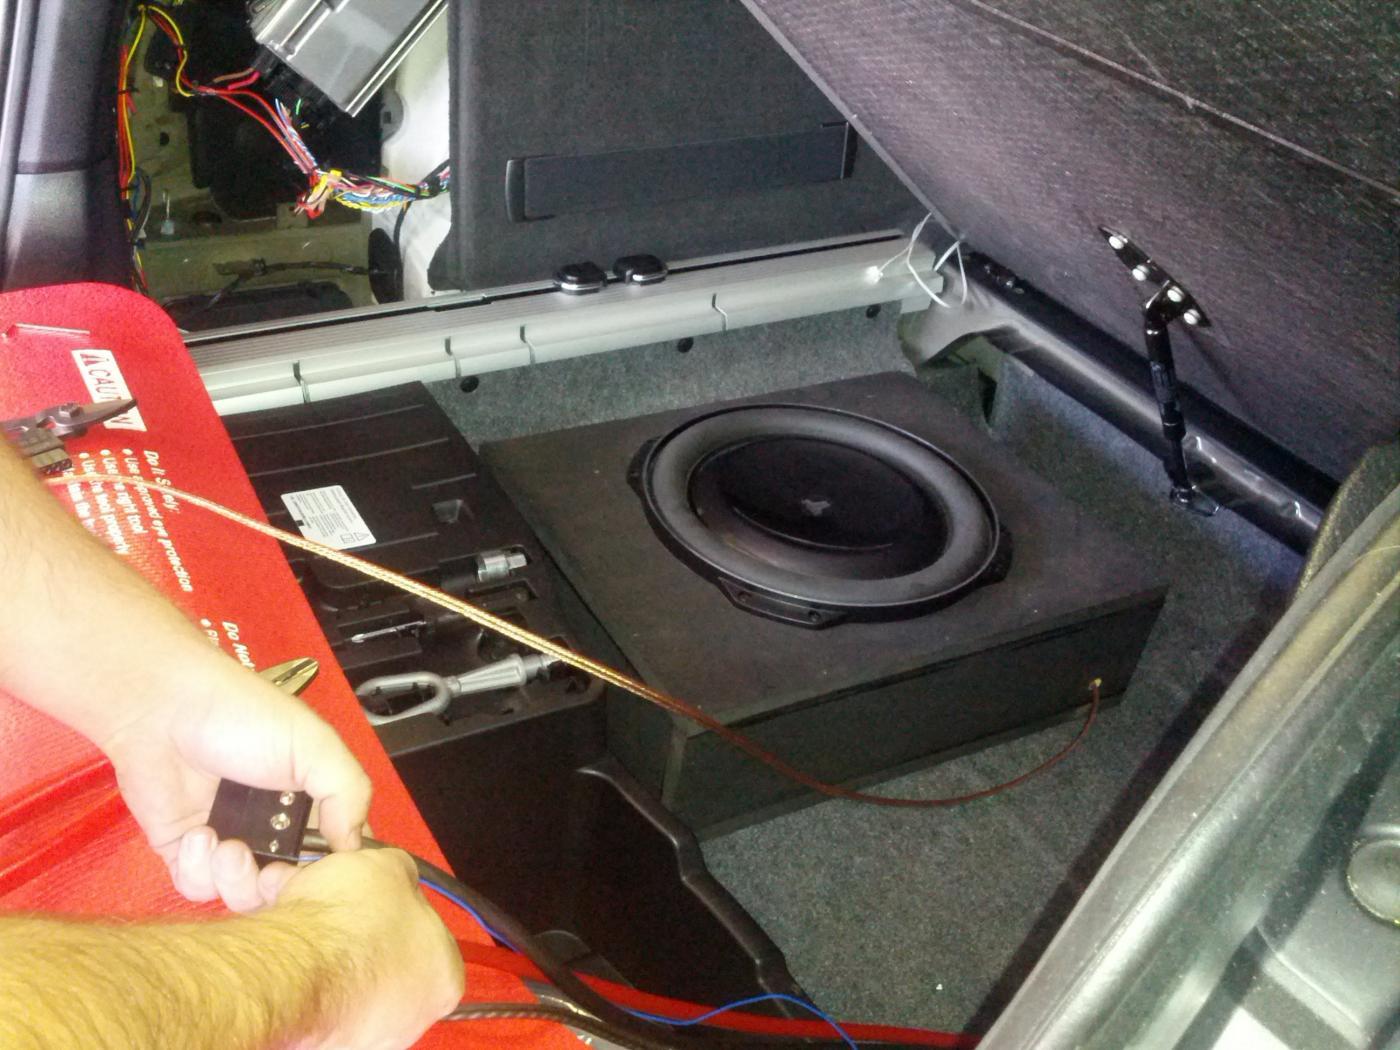 So Close 2013 Bmw X6 Xdrive50i M Perf Upgrades